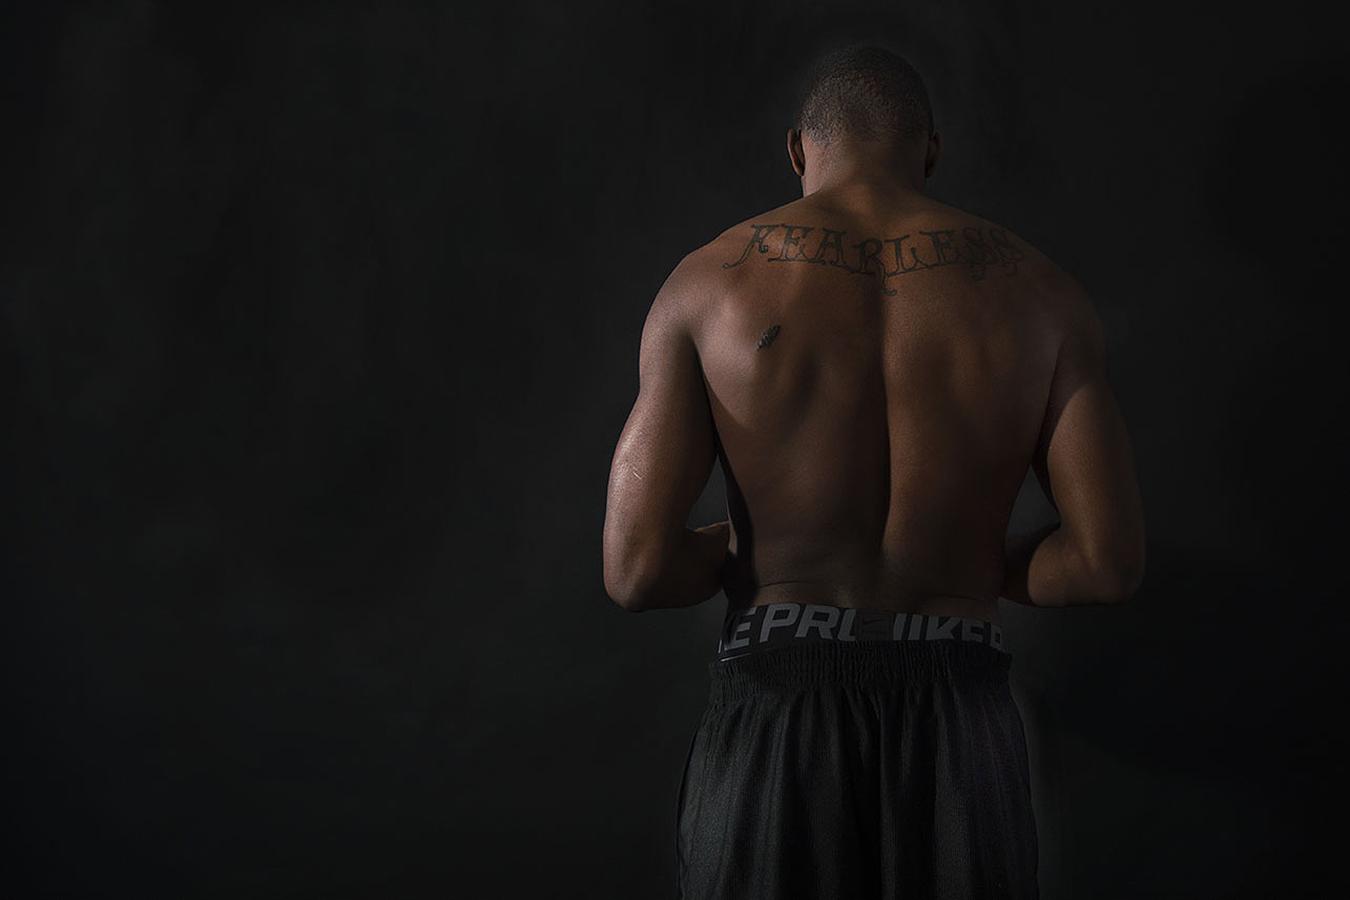 Soraya_Hebron_photography_tony_Hicks_portraiture_black_male_ivy_league_atheletes_basketball_players_fearless_back_muscular_football